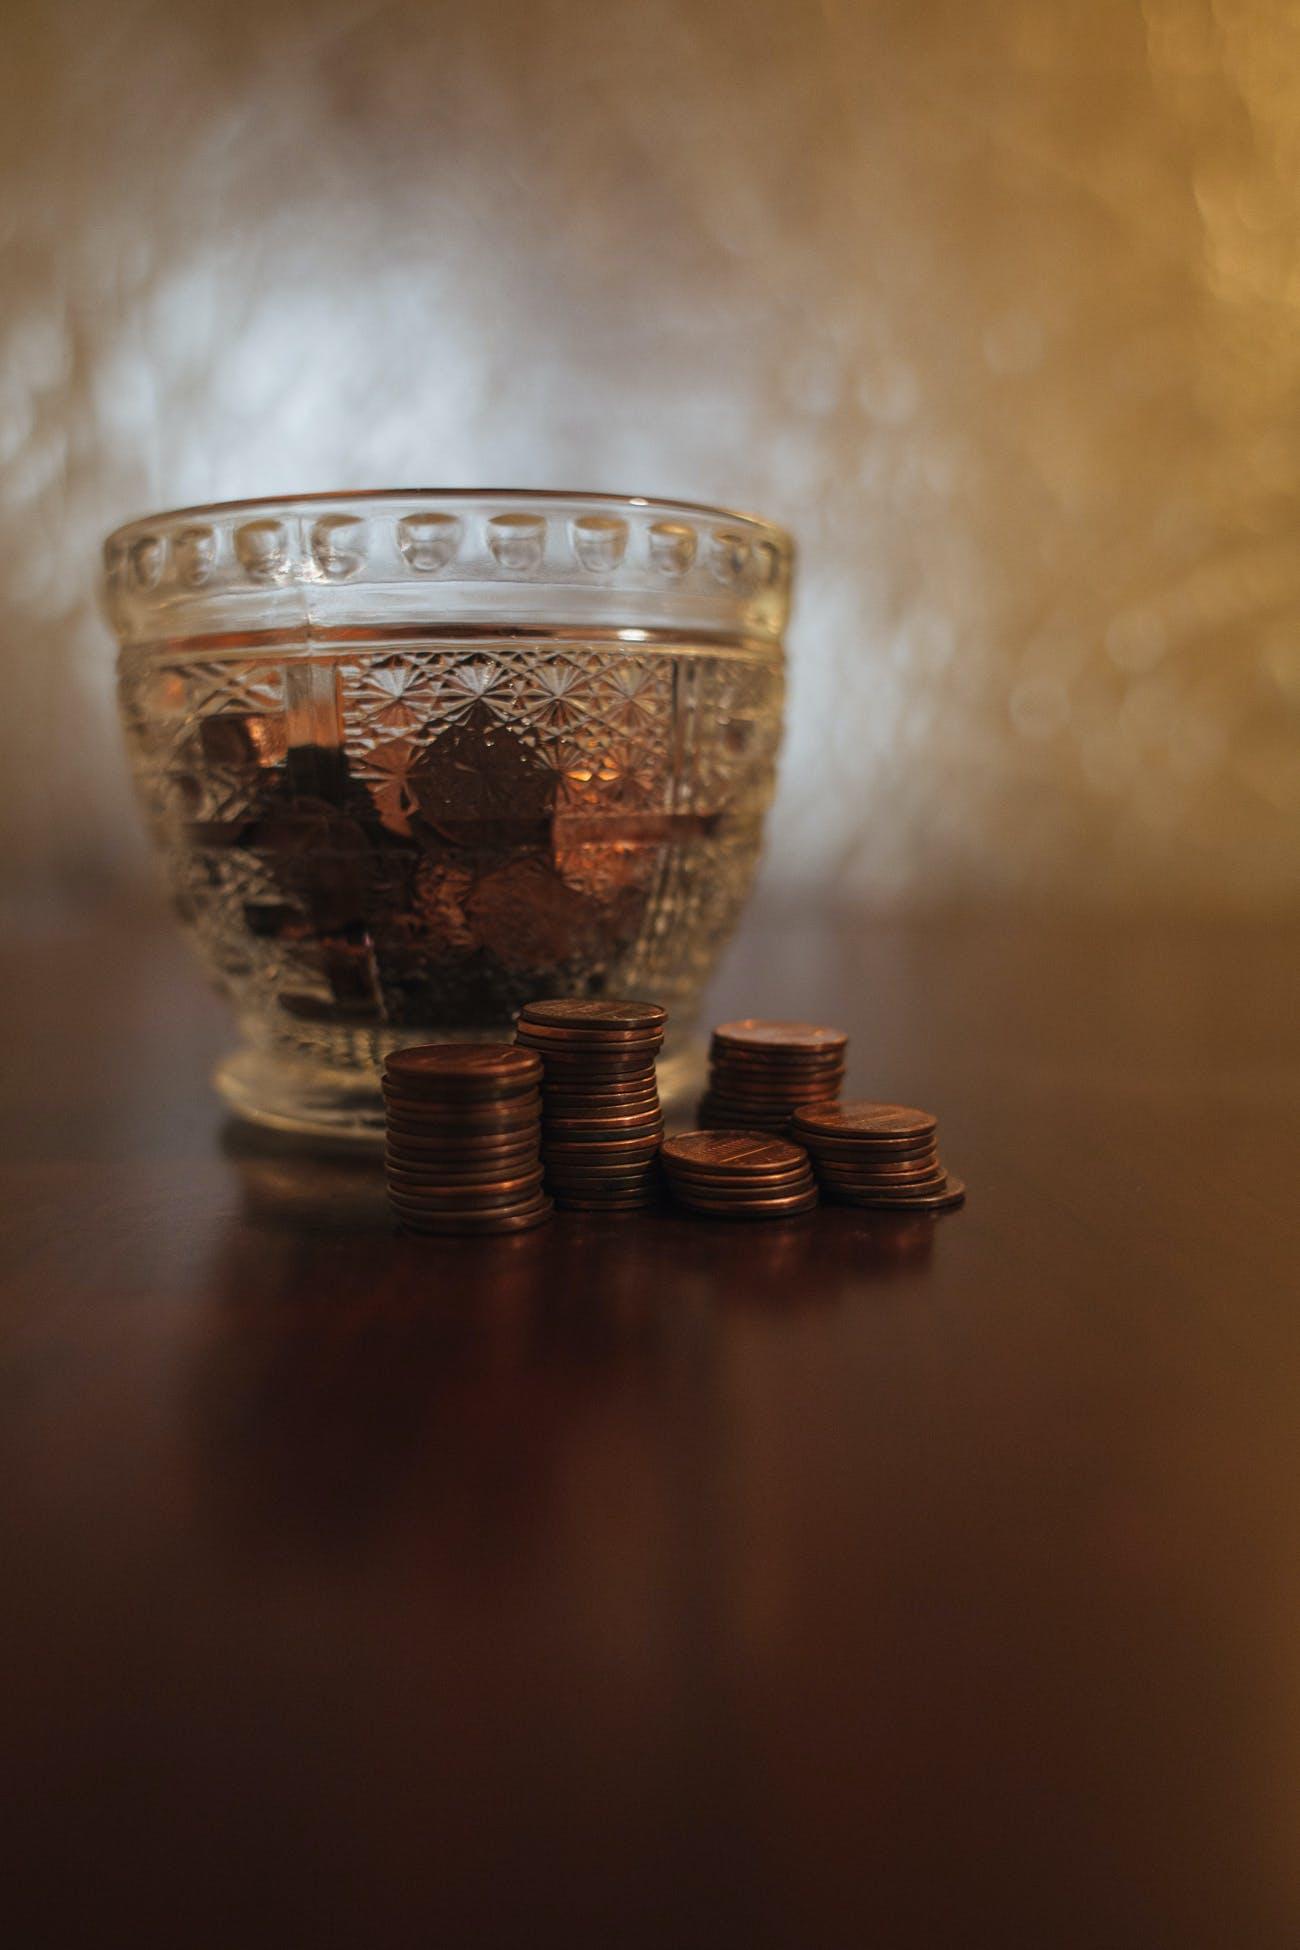 Free stock photo of money, coins, jar, theme minimalism